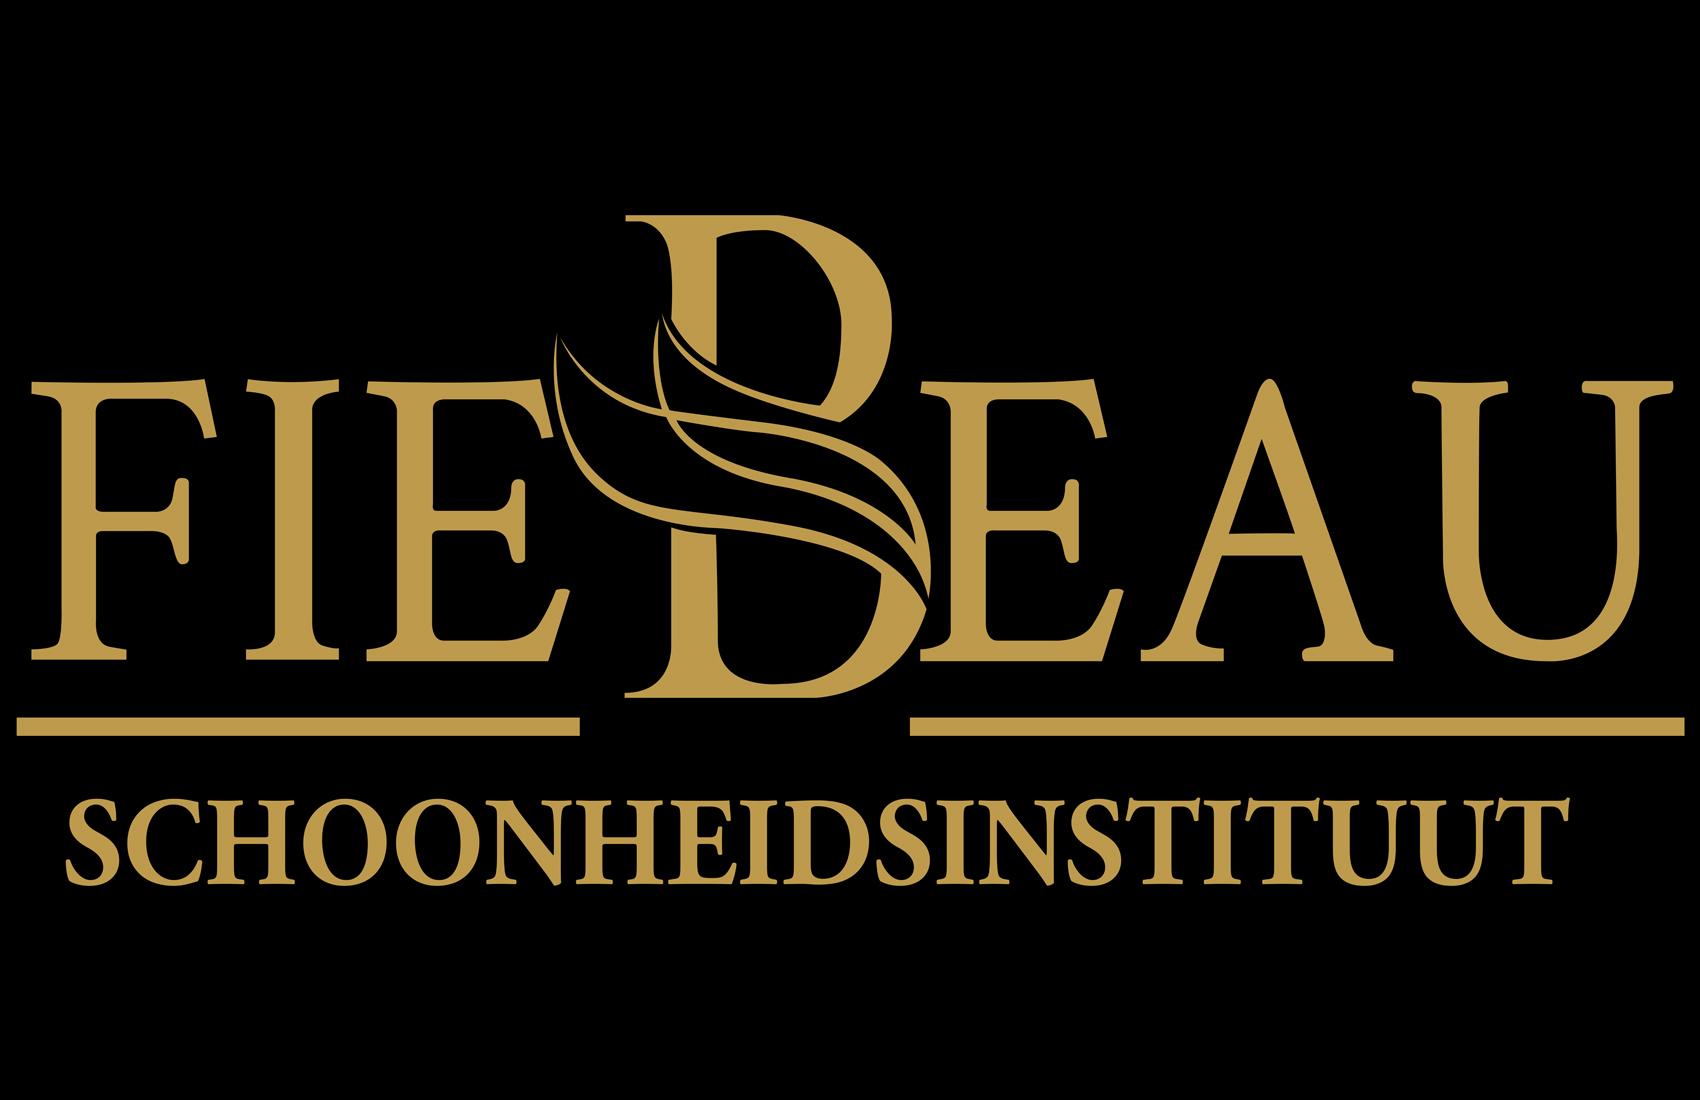 FIEBEAU Schoonheidsinstituut